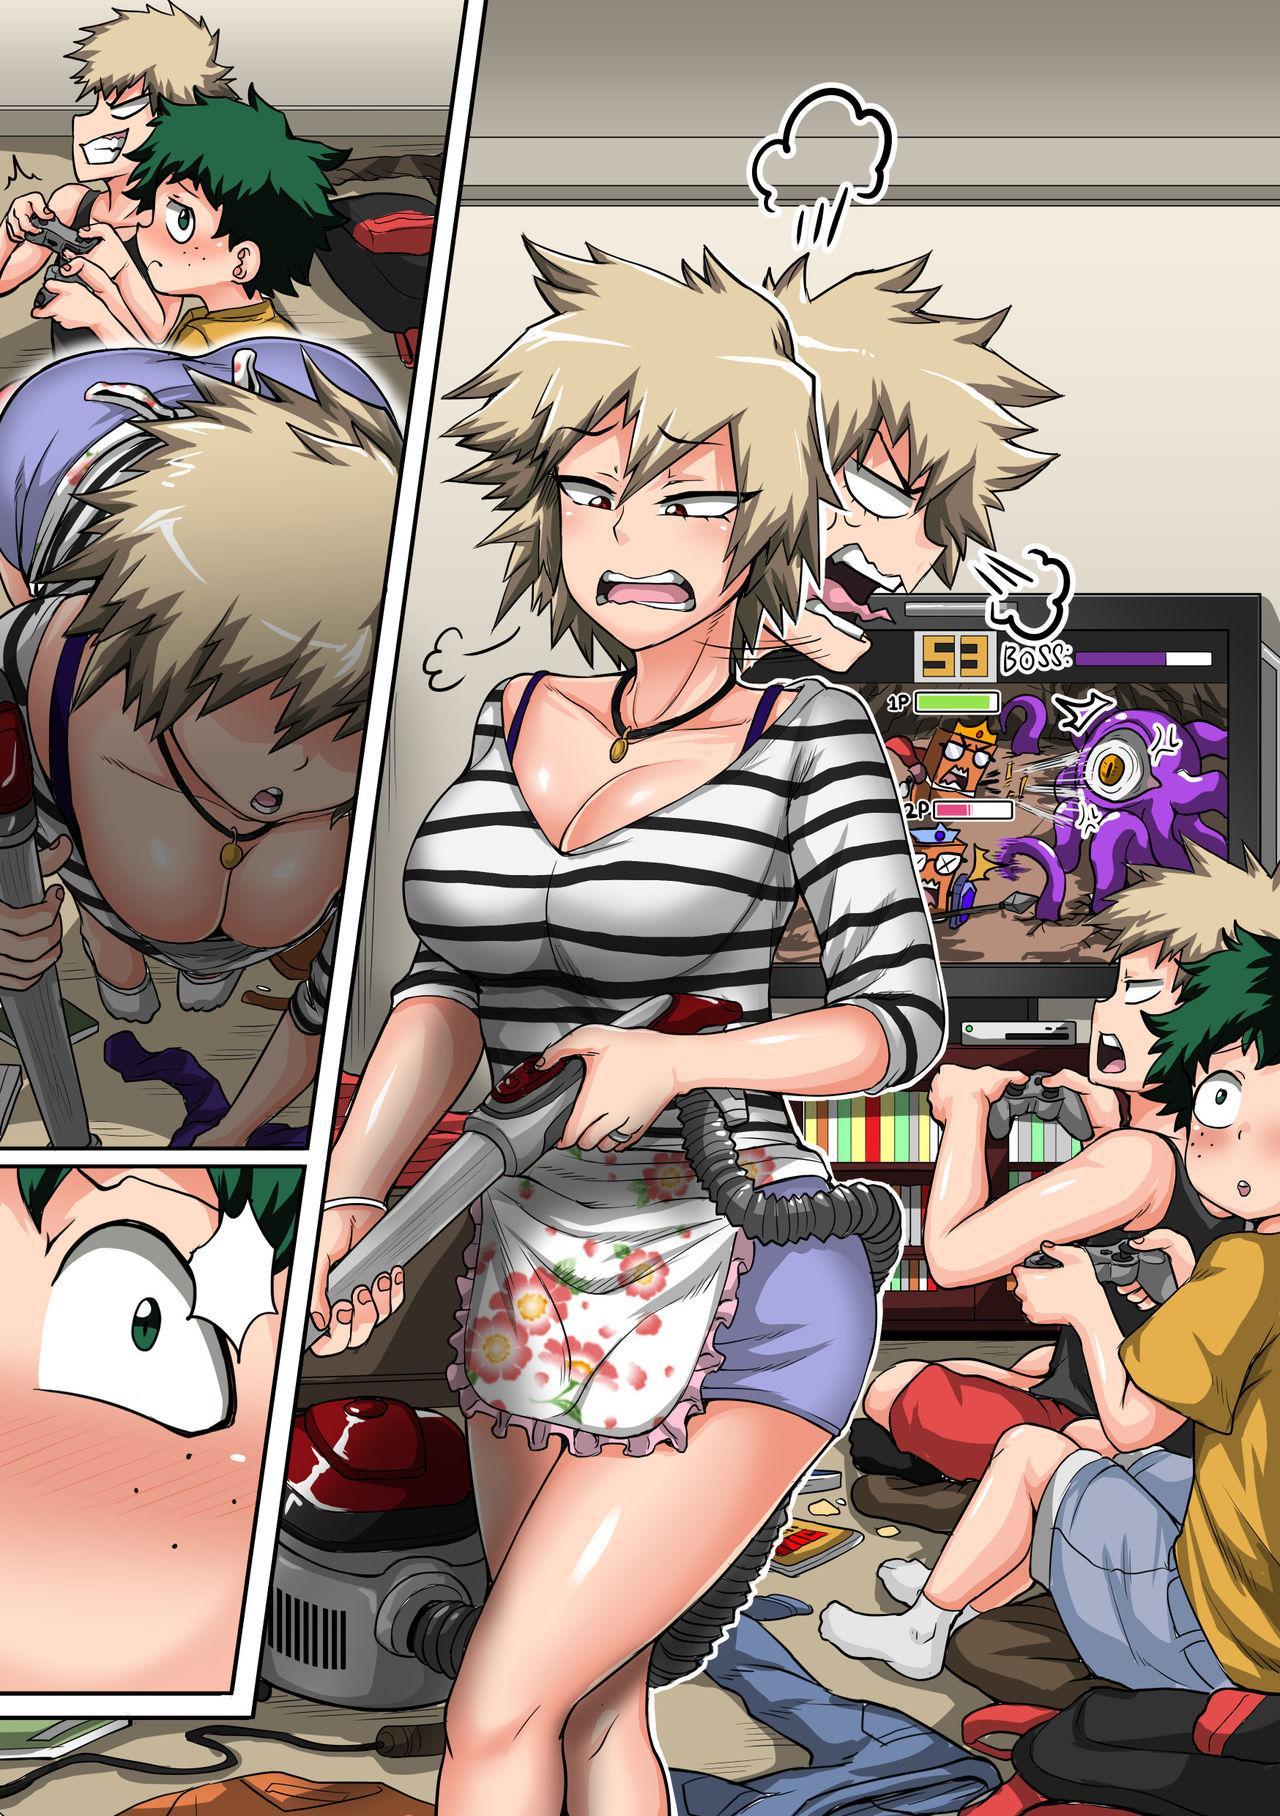 [Juna Juna Juice] Bakugou Mama Rakugaki 1~15 + Bonus | Bakugou's Mom Doodle 1~15 + Bonus [English] 54